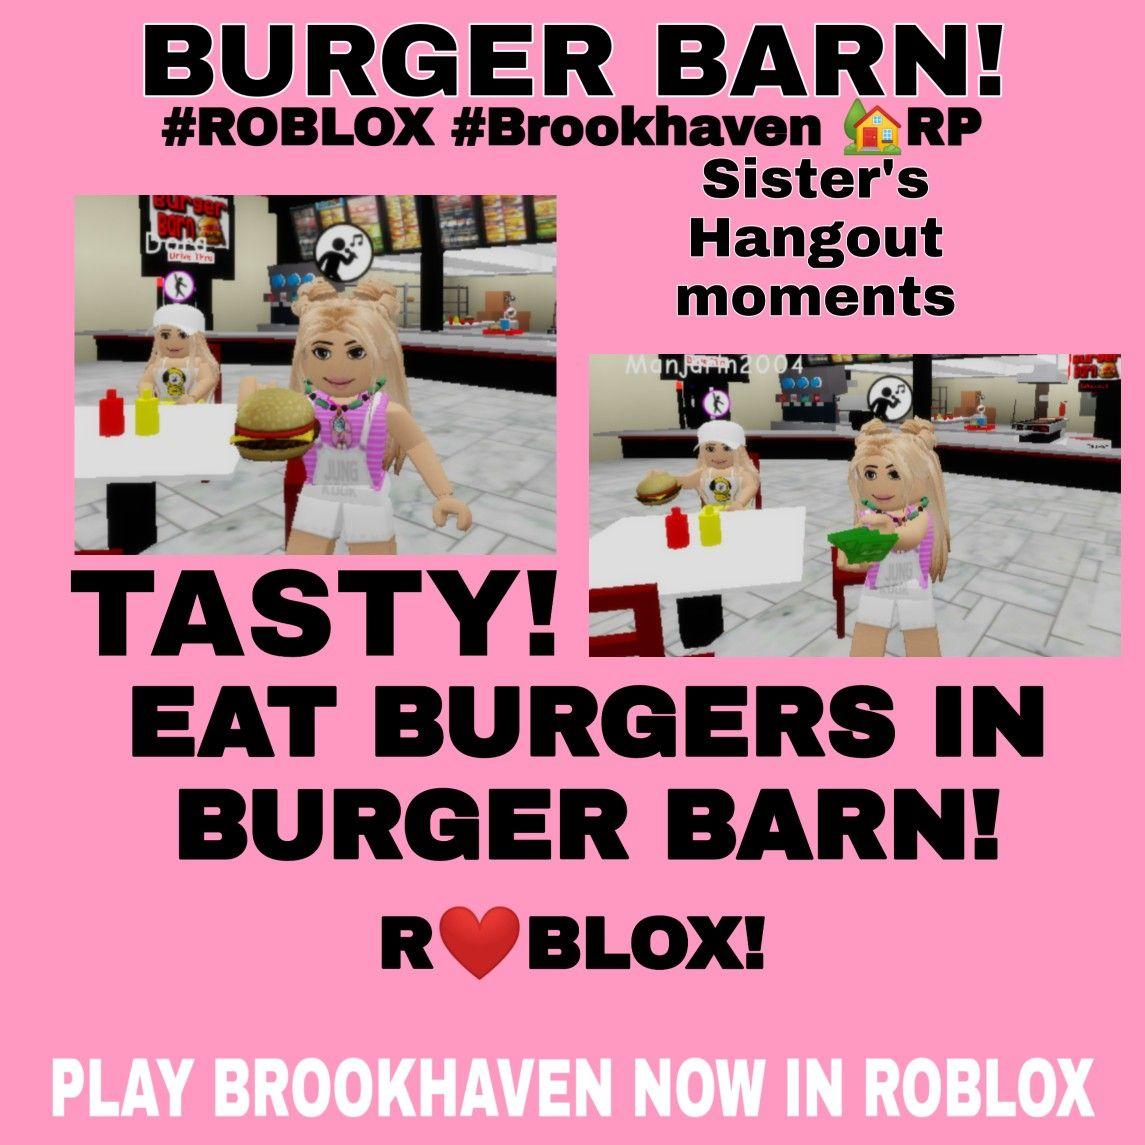 Burger Barn In Roblox Brookhaven Rp Brookhaven Roblox Burger Barn